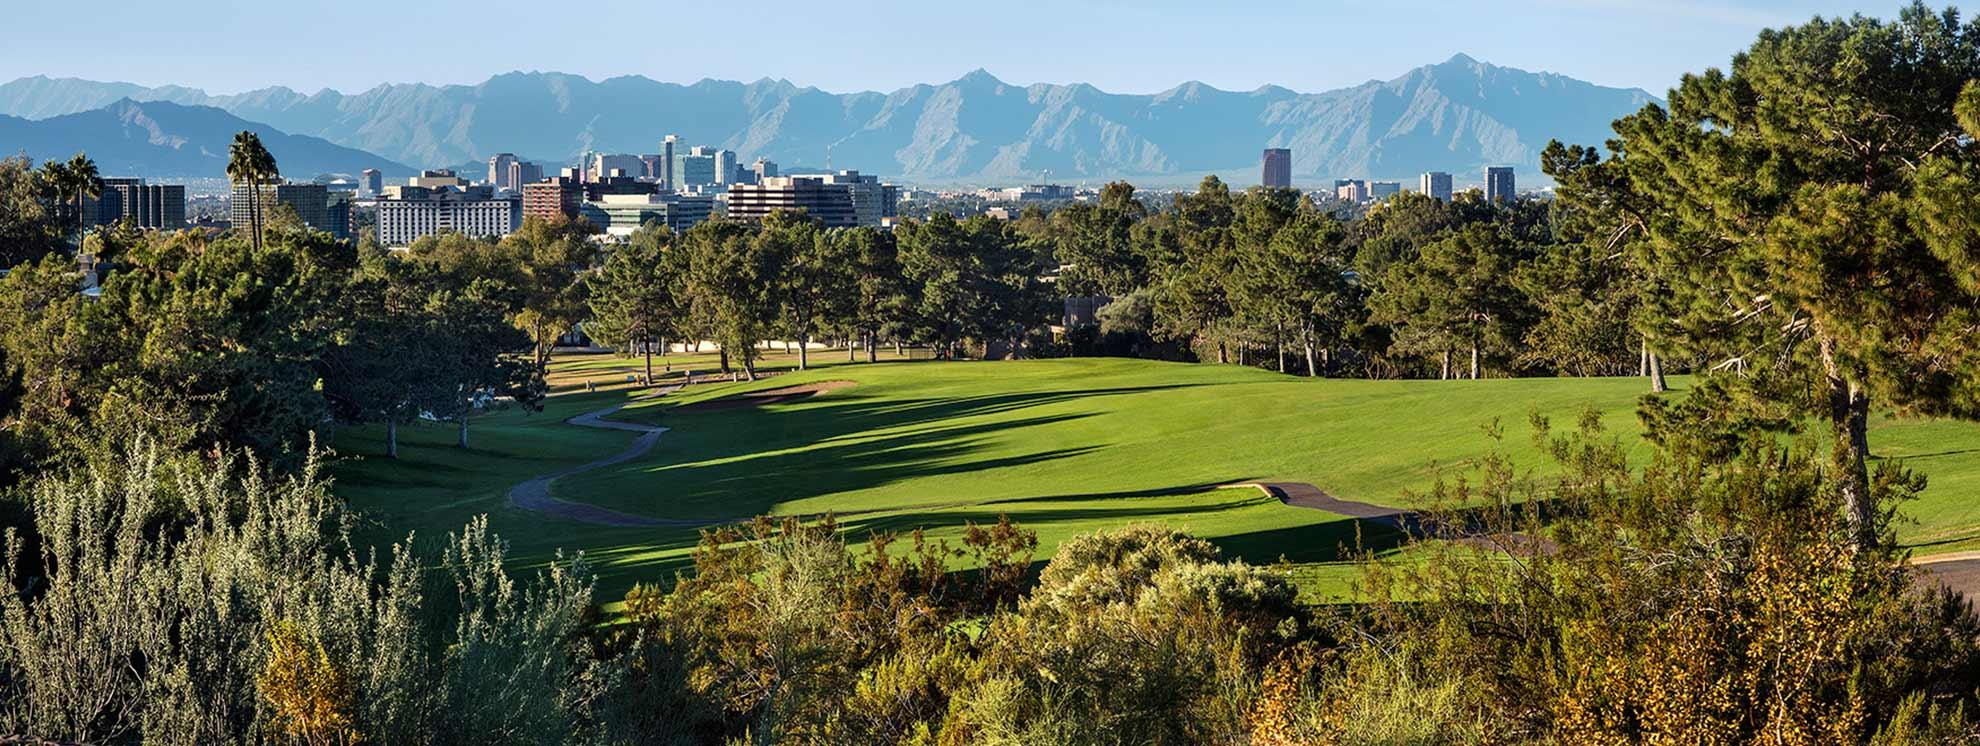 golf course phoenix